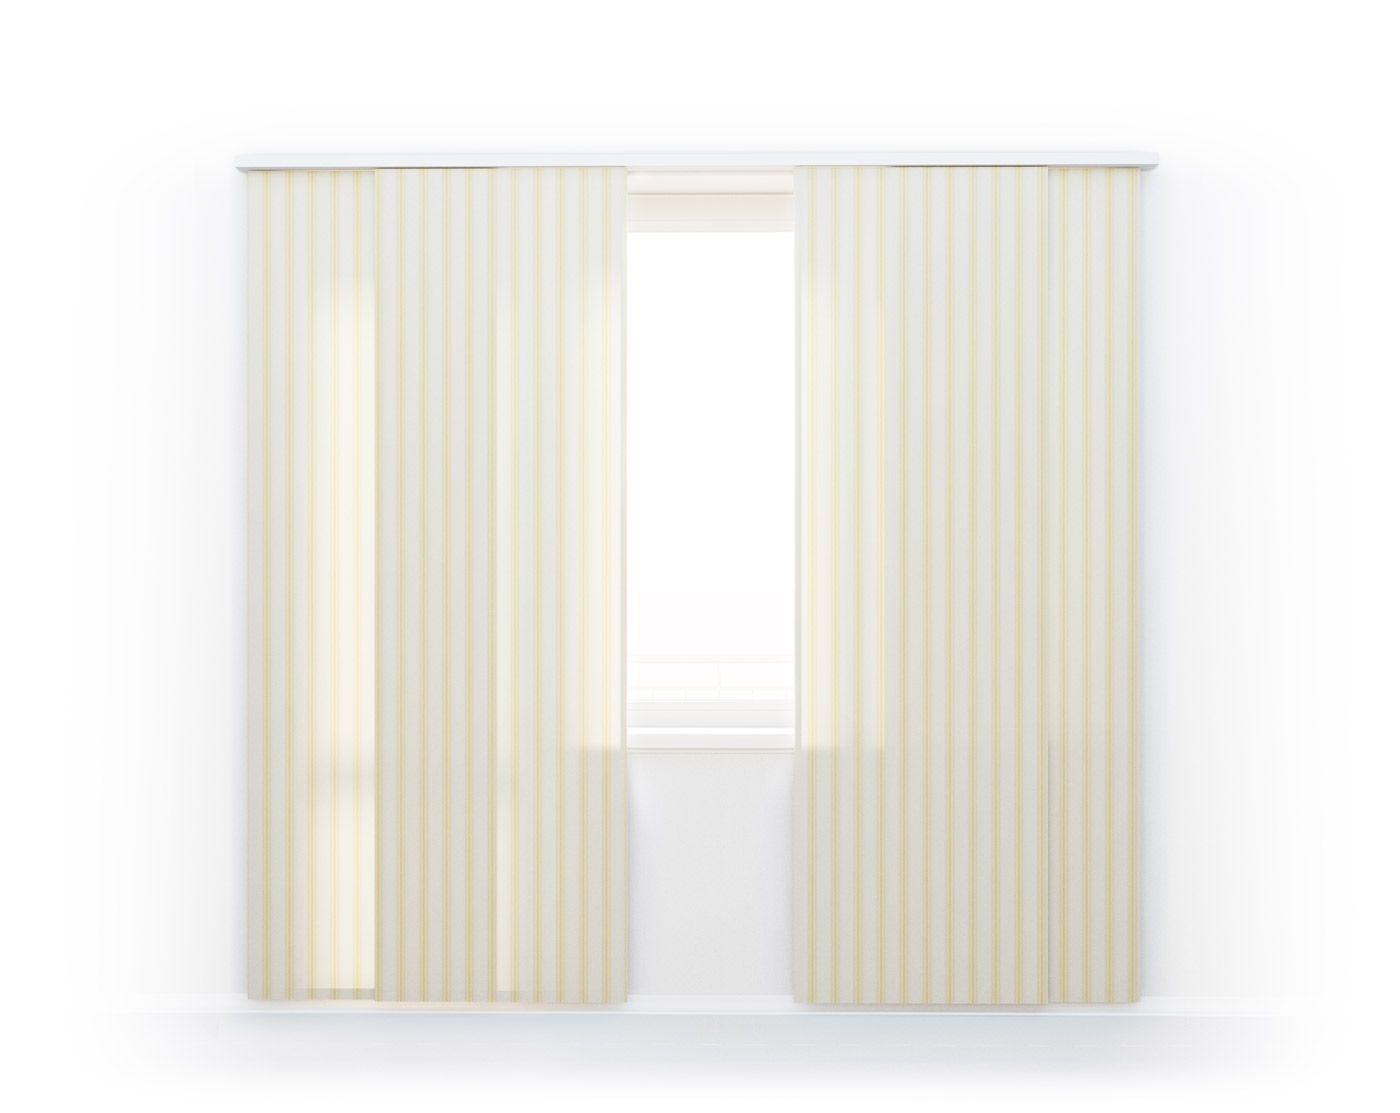 Японские шторы Louis D'or, 2385/15